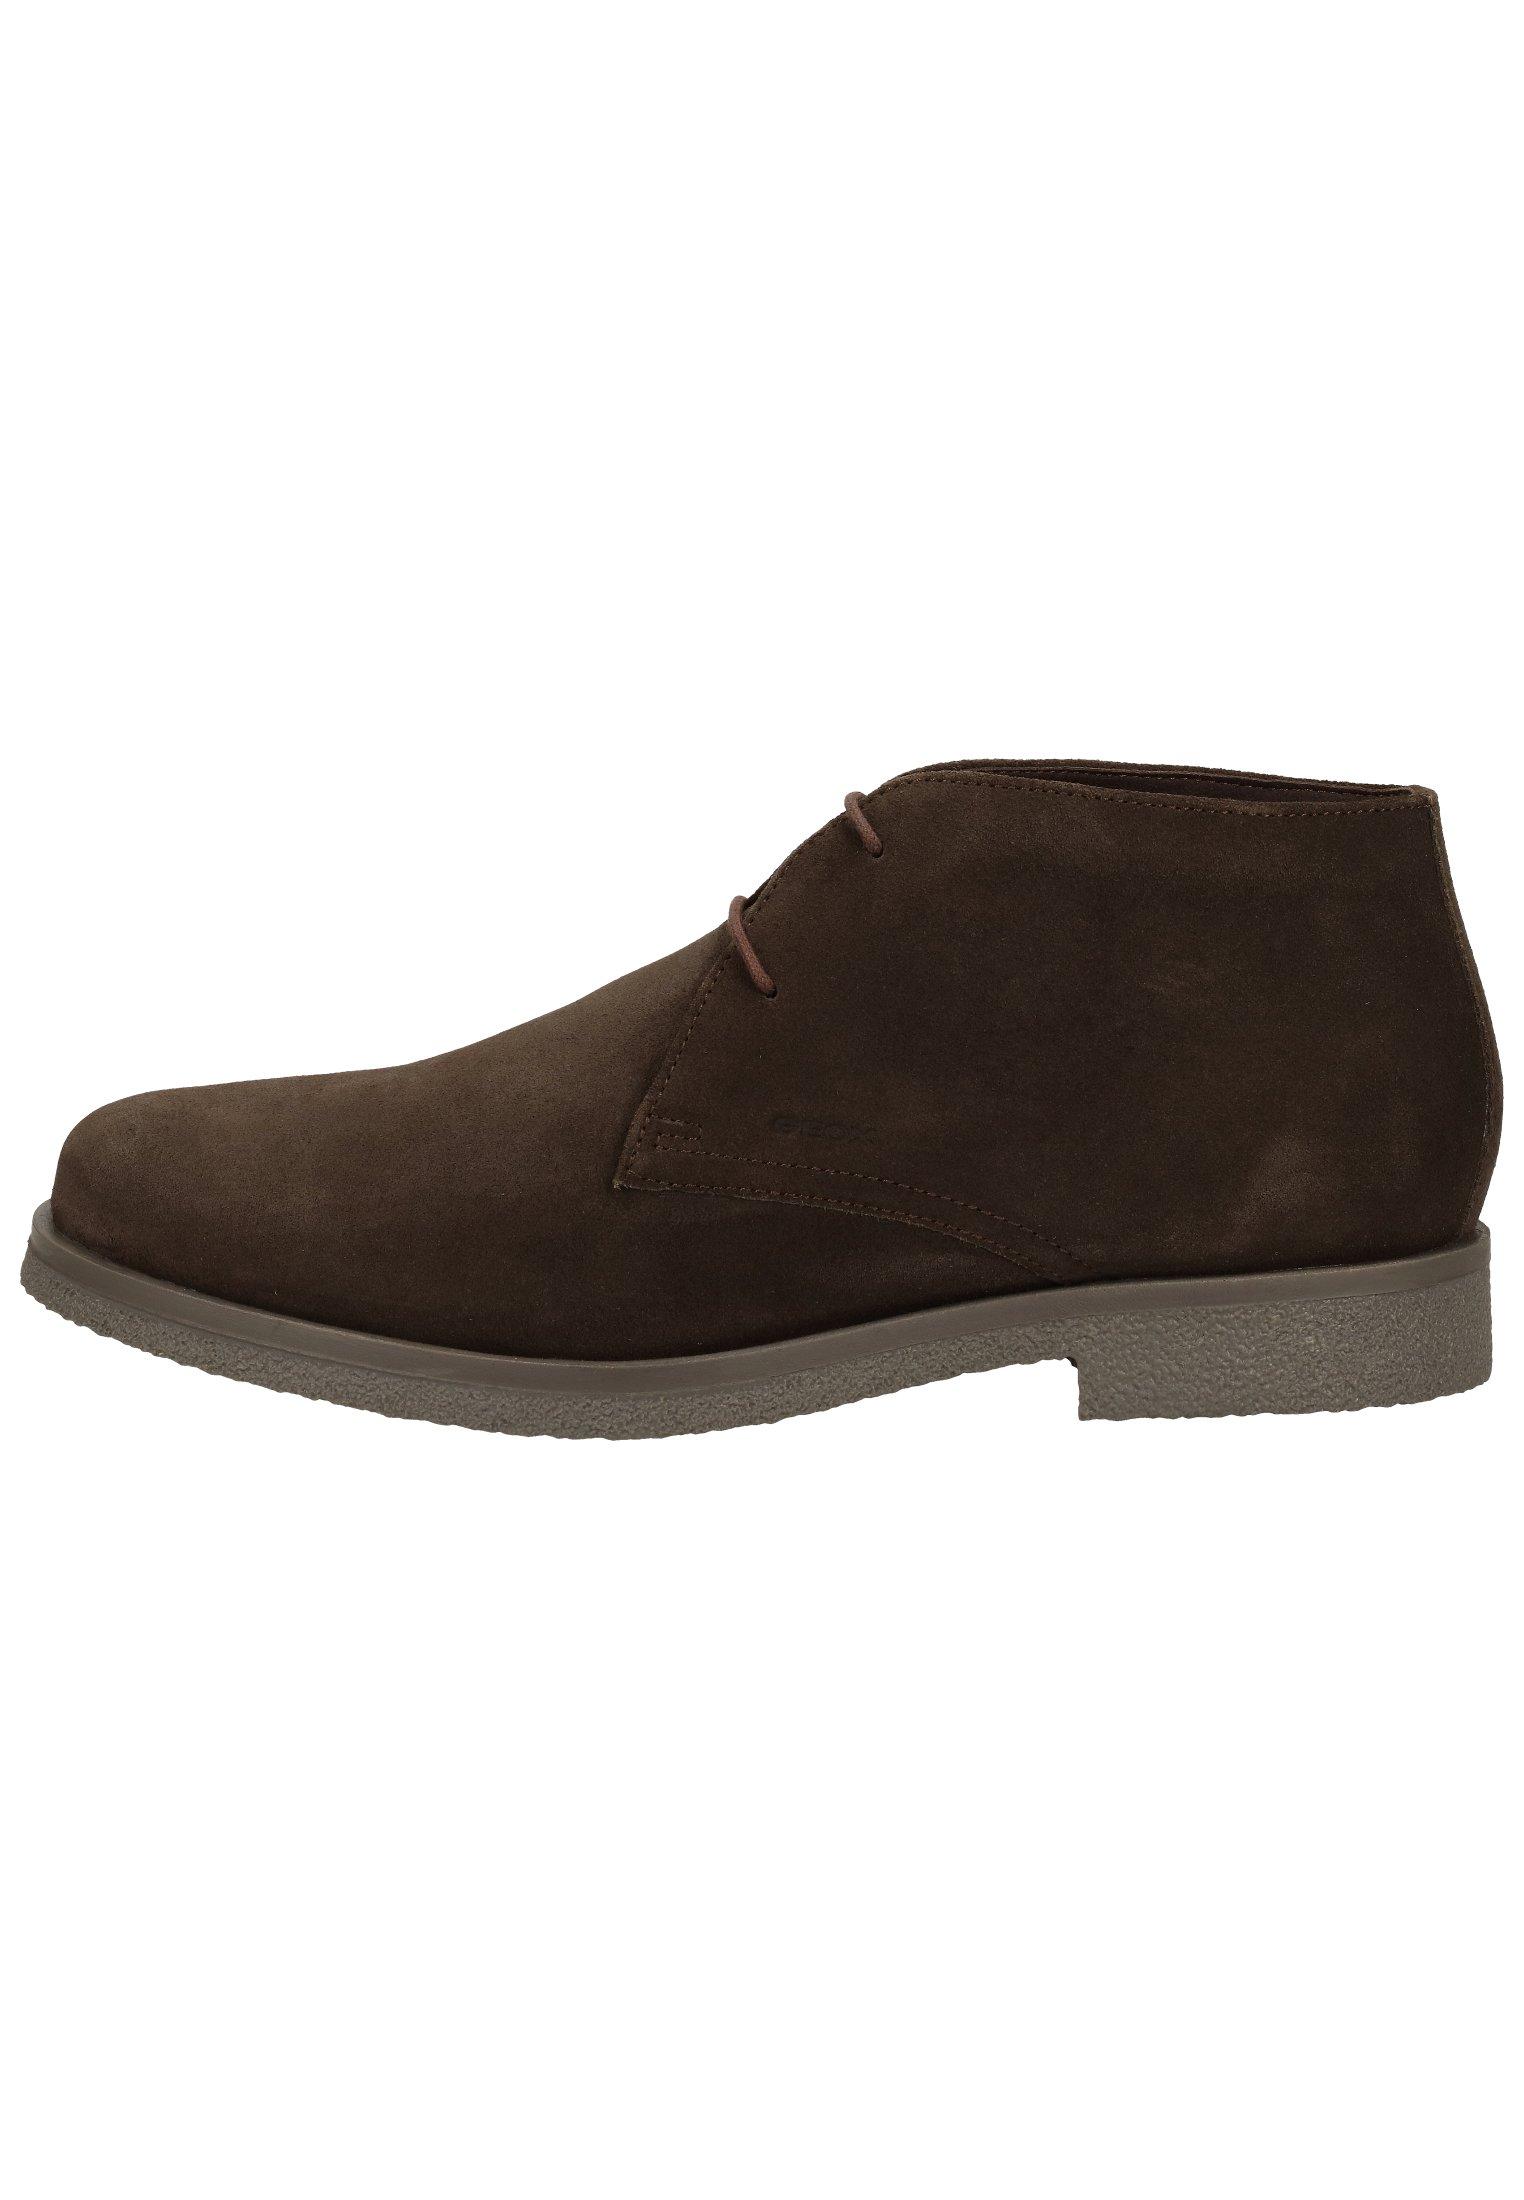 Homme UOMO CLAUDIO - Chaussures à lacets